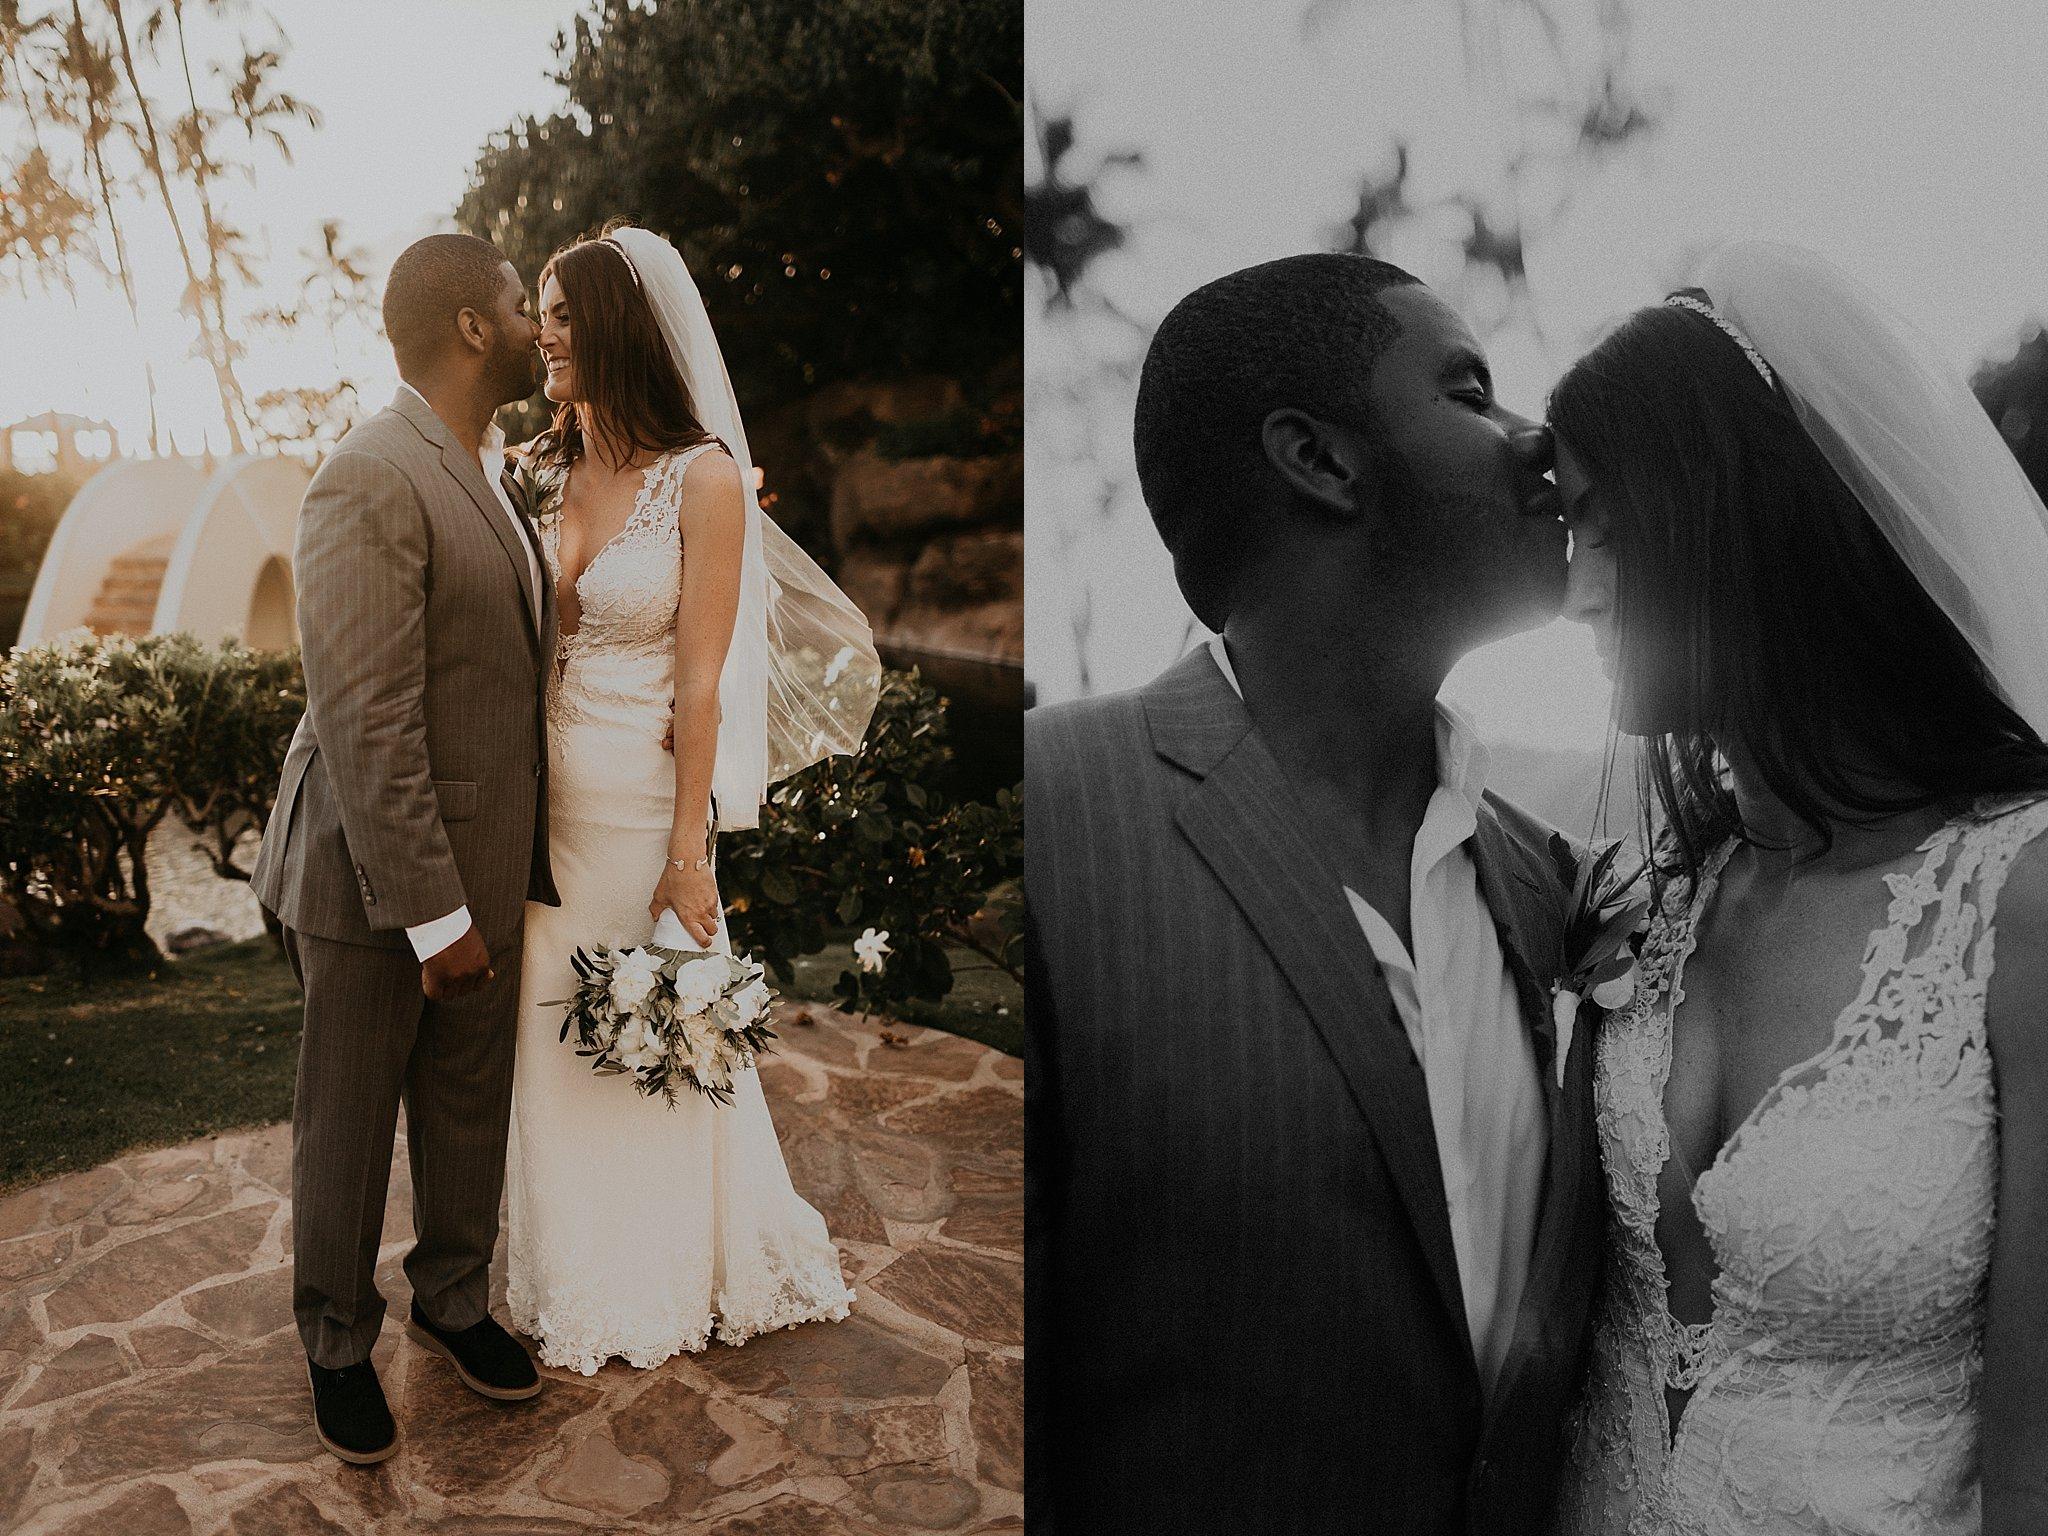 samantha_mcfarlen_bellingham_washington_engagement_photography_seattle_wedding_photographer_0233.jpg